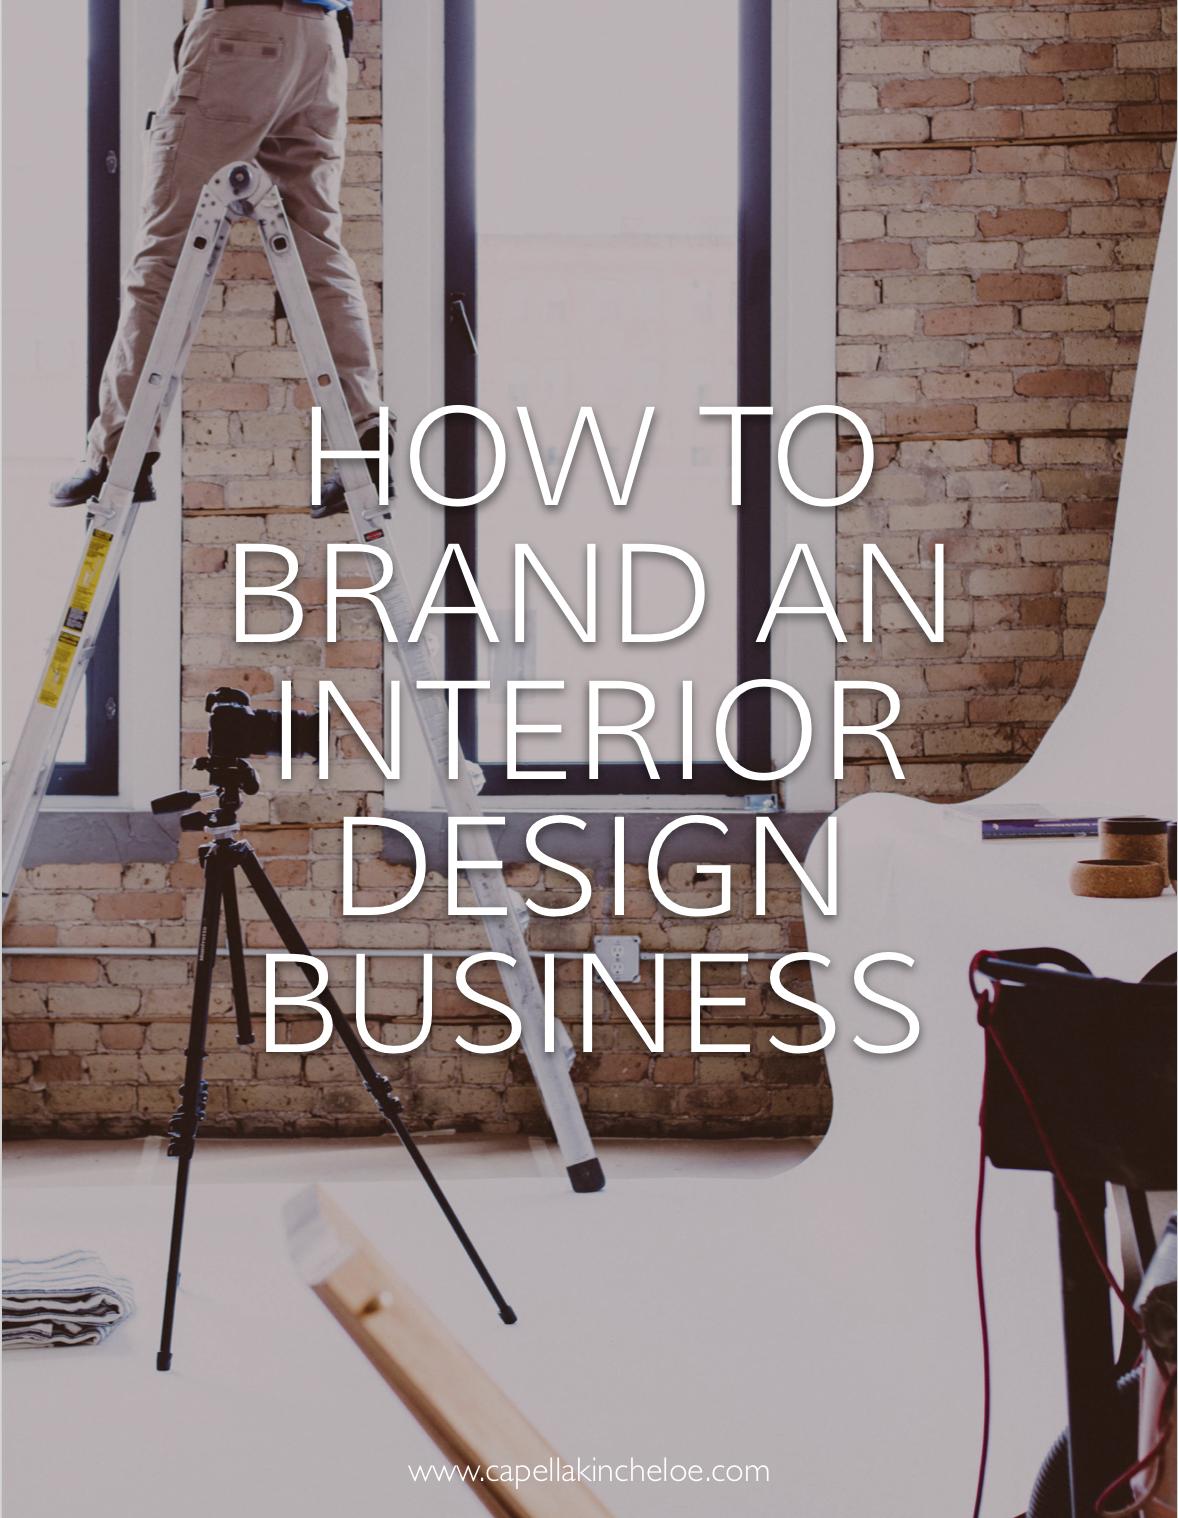 Branding For Interior Design Business Business Design Interior